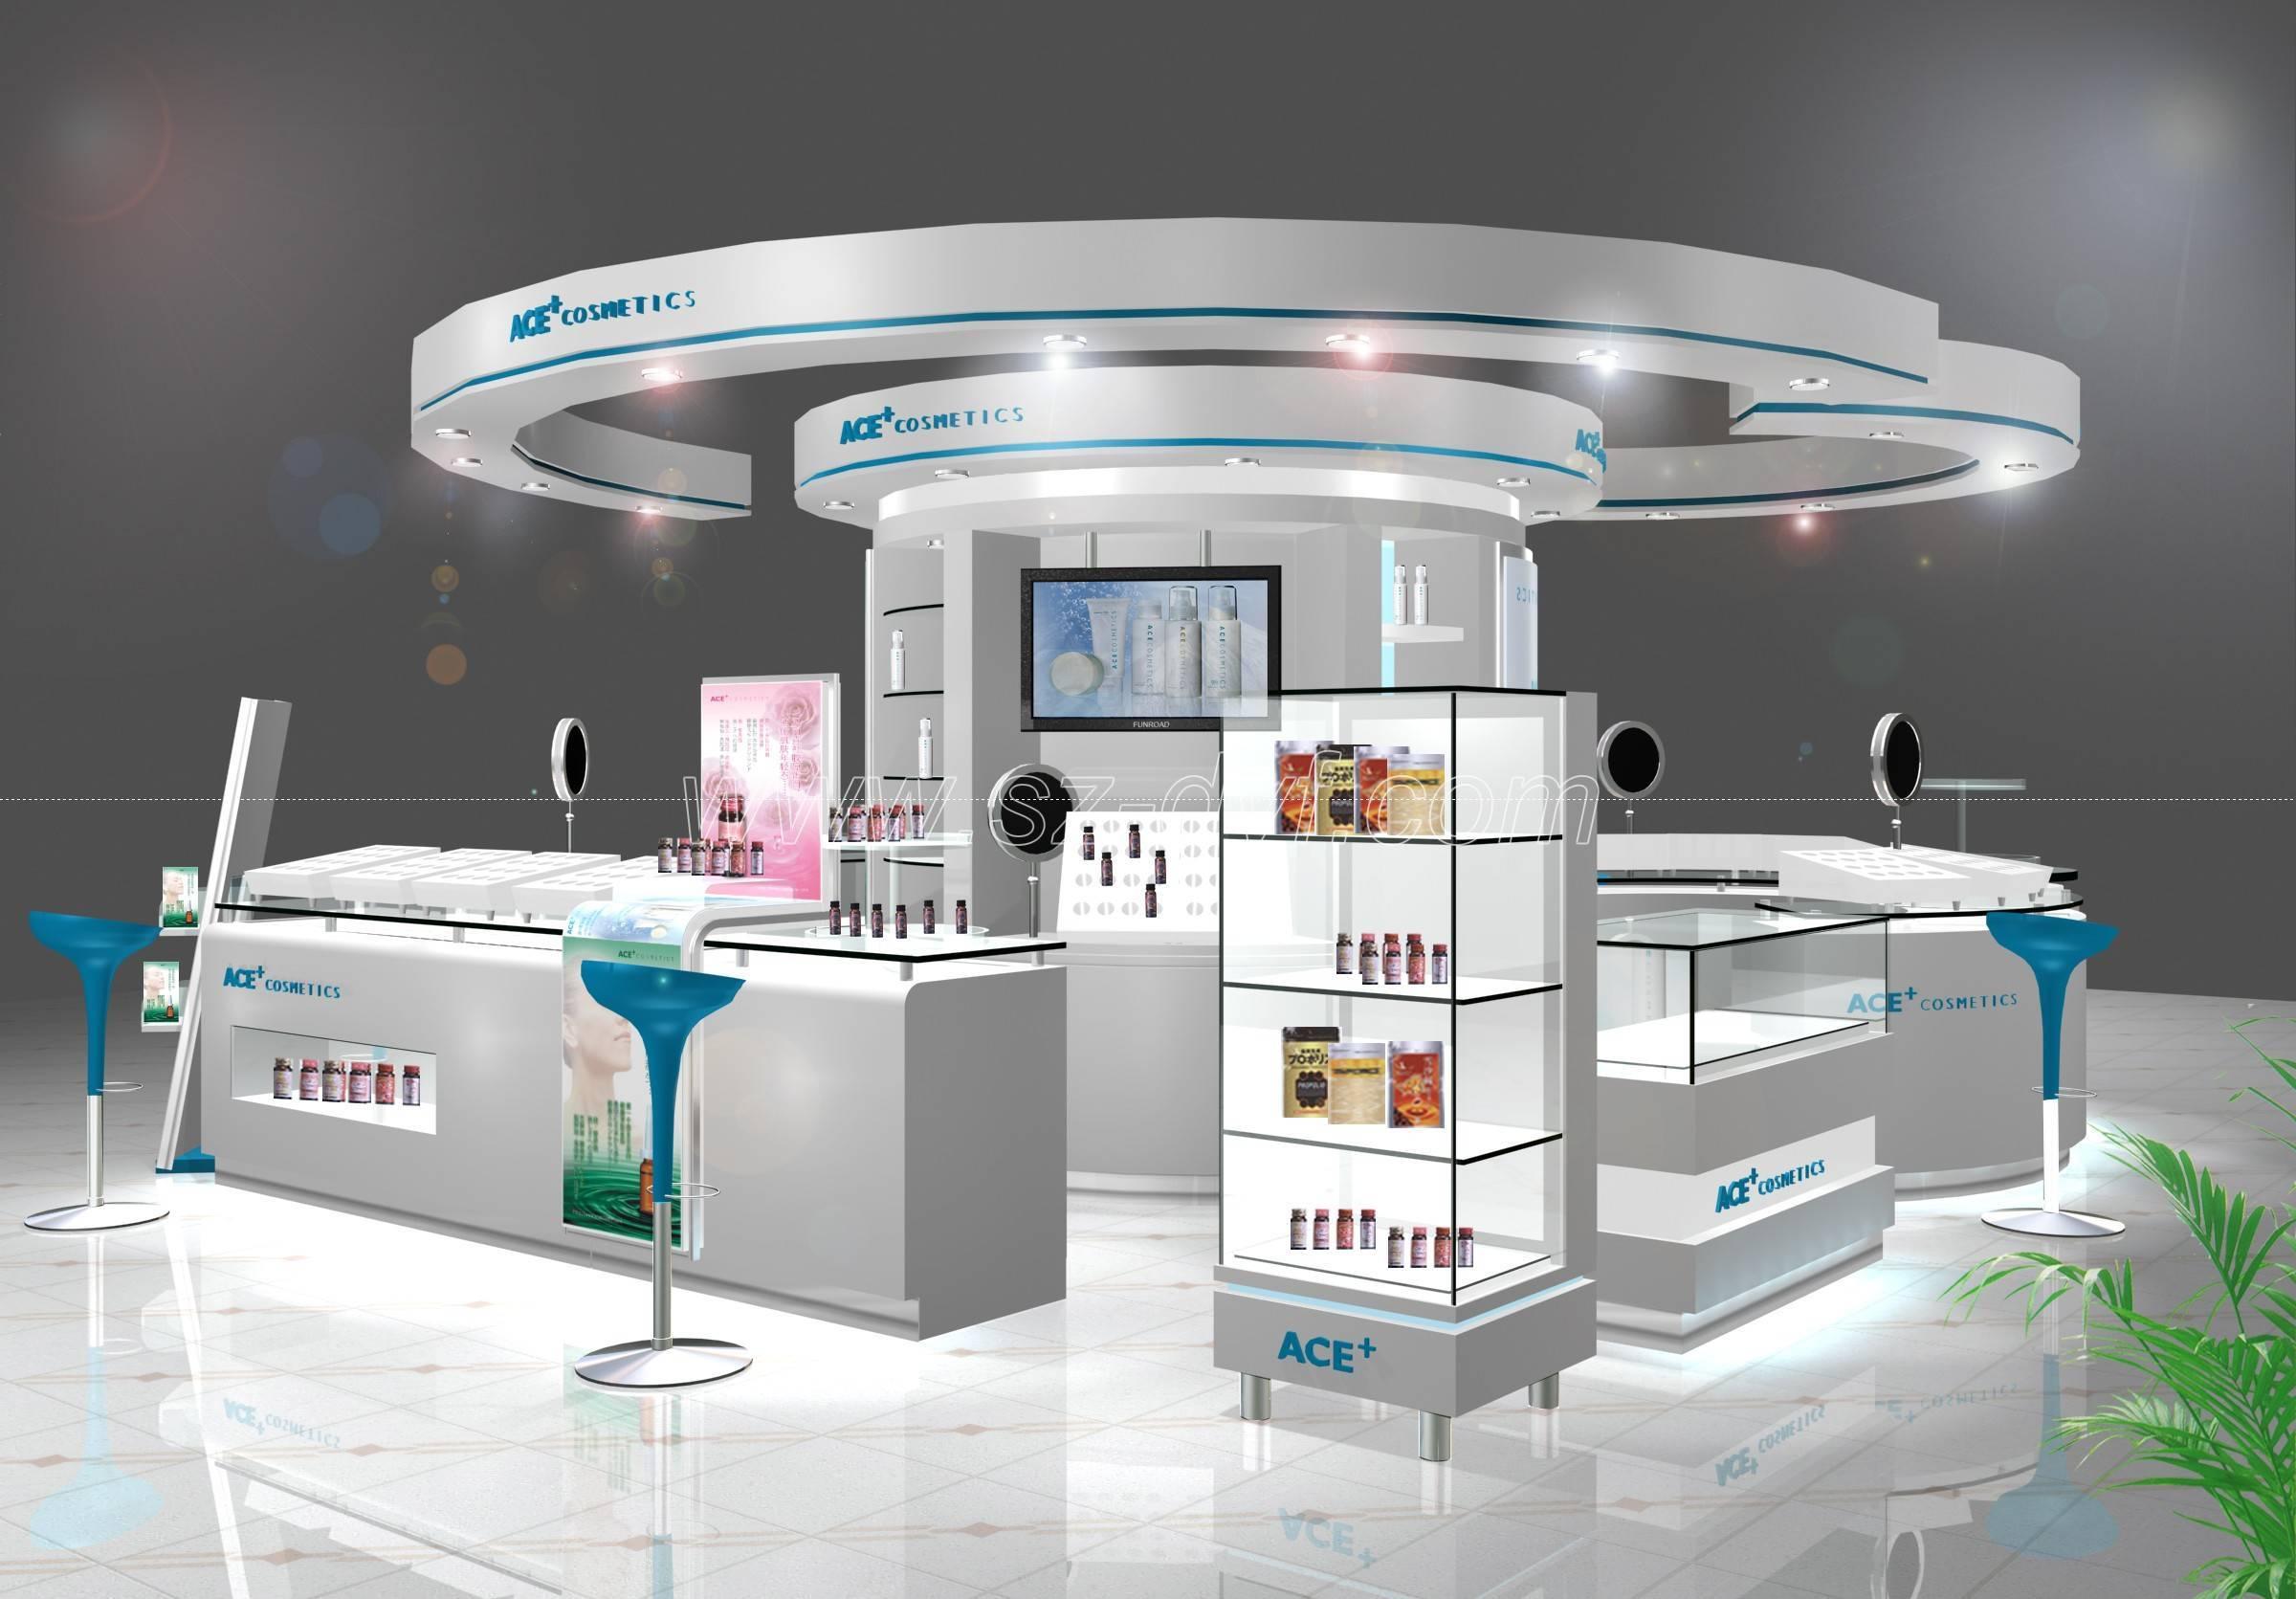 Exhibition Stand Display : Cosmetics display showcase kiosk stand shenzhen